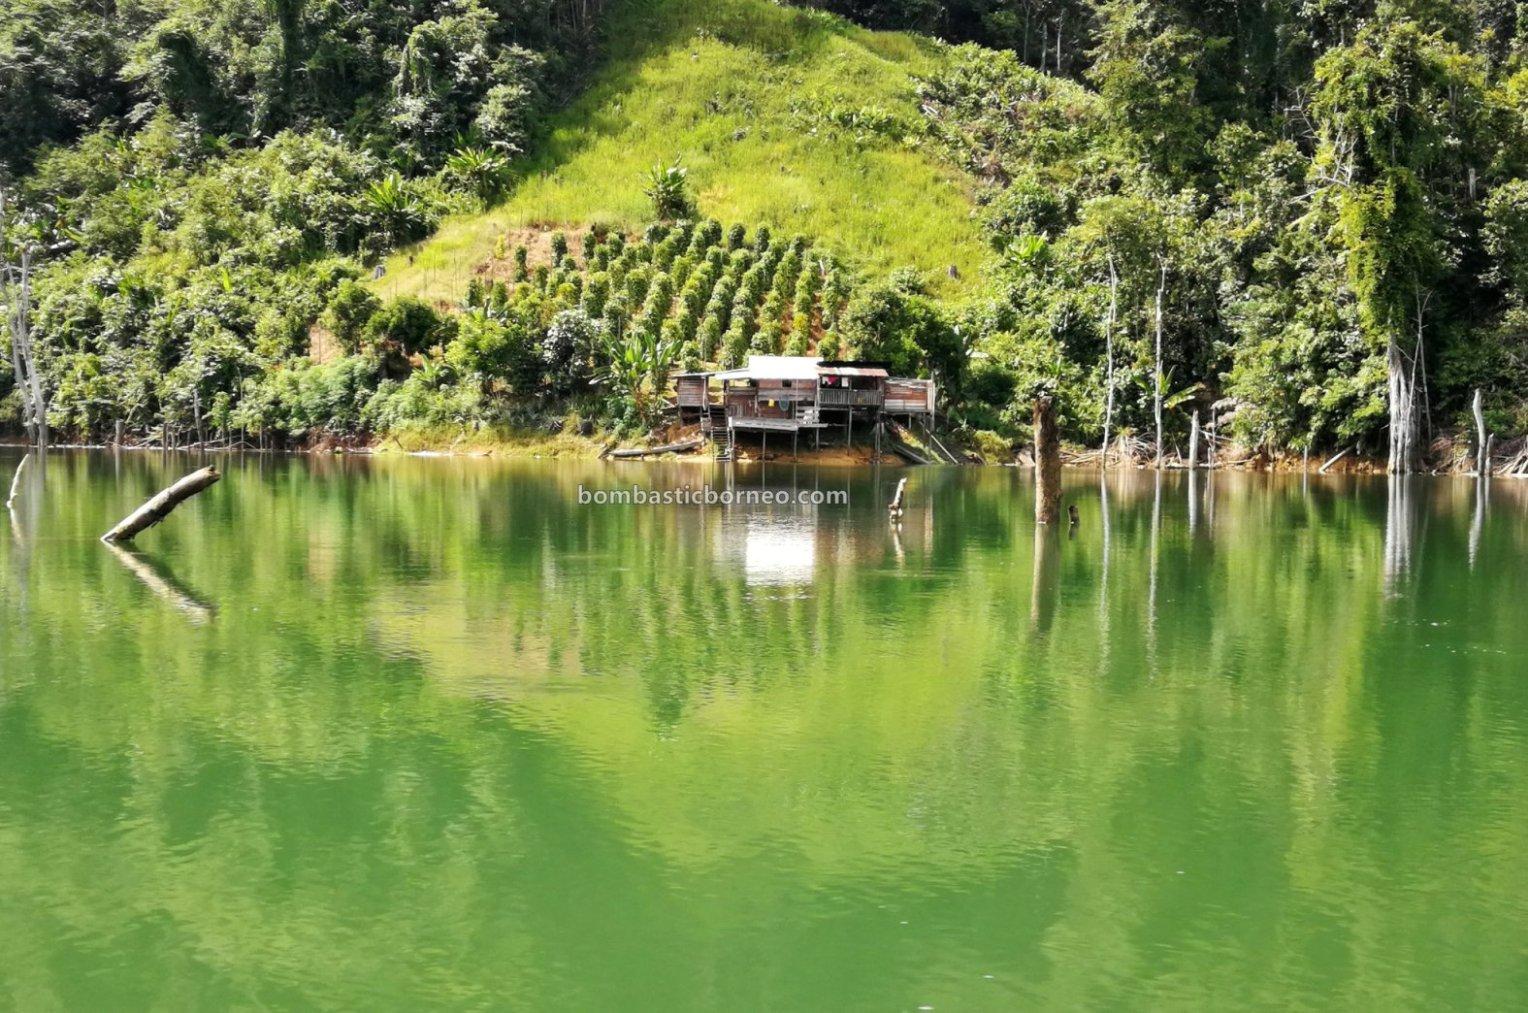 Bakun Embankment Dam, empangan, native, destination, Sungai Balui, traditional, fishing trip, Sarawak, Kapit, Malaysia, Tourism, tourist attraction, travel guide, Borneo, 马来西亚钓鱼之旅,